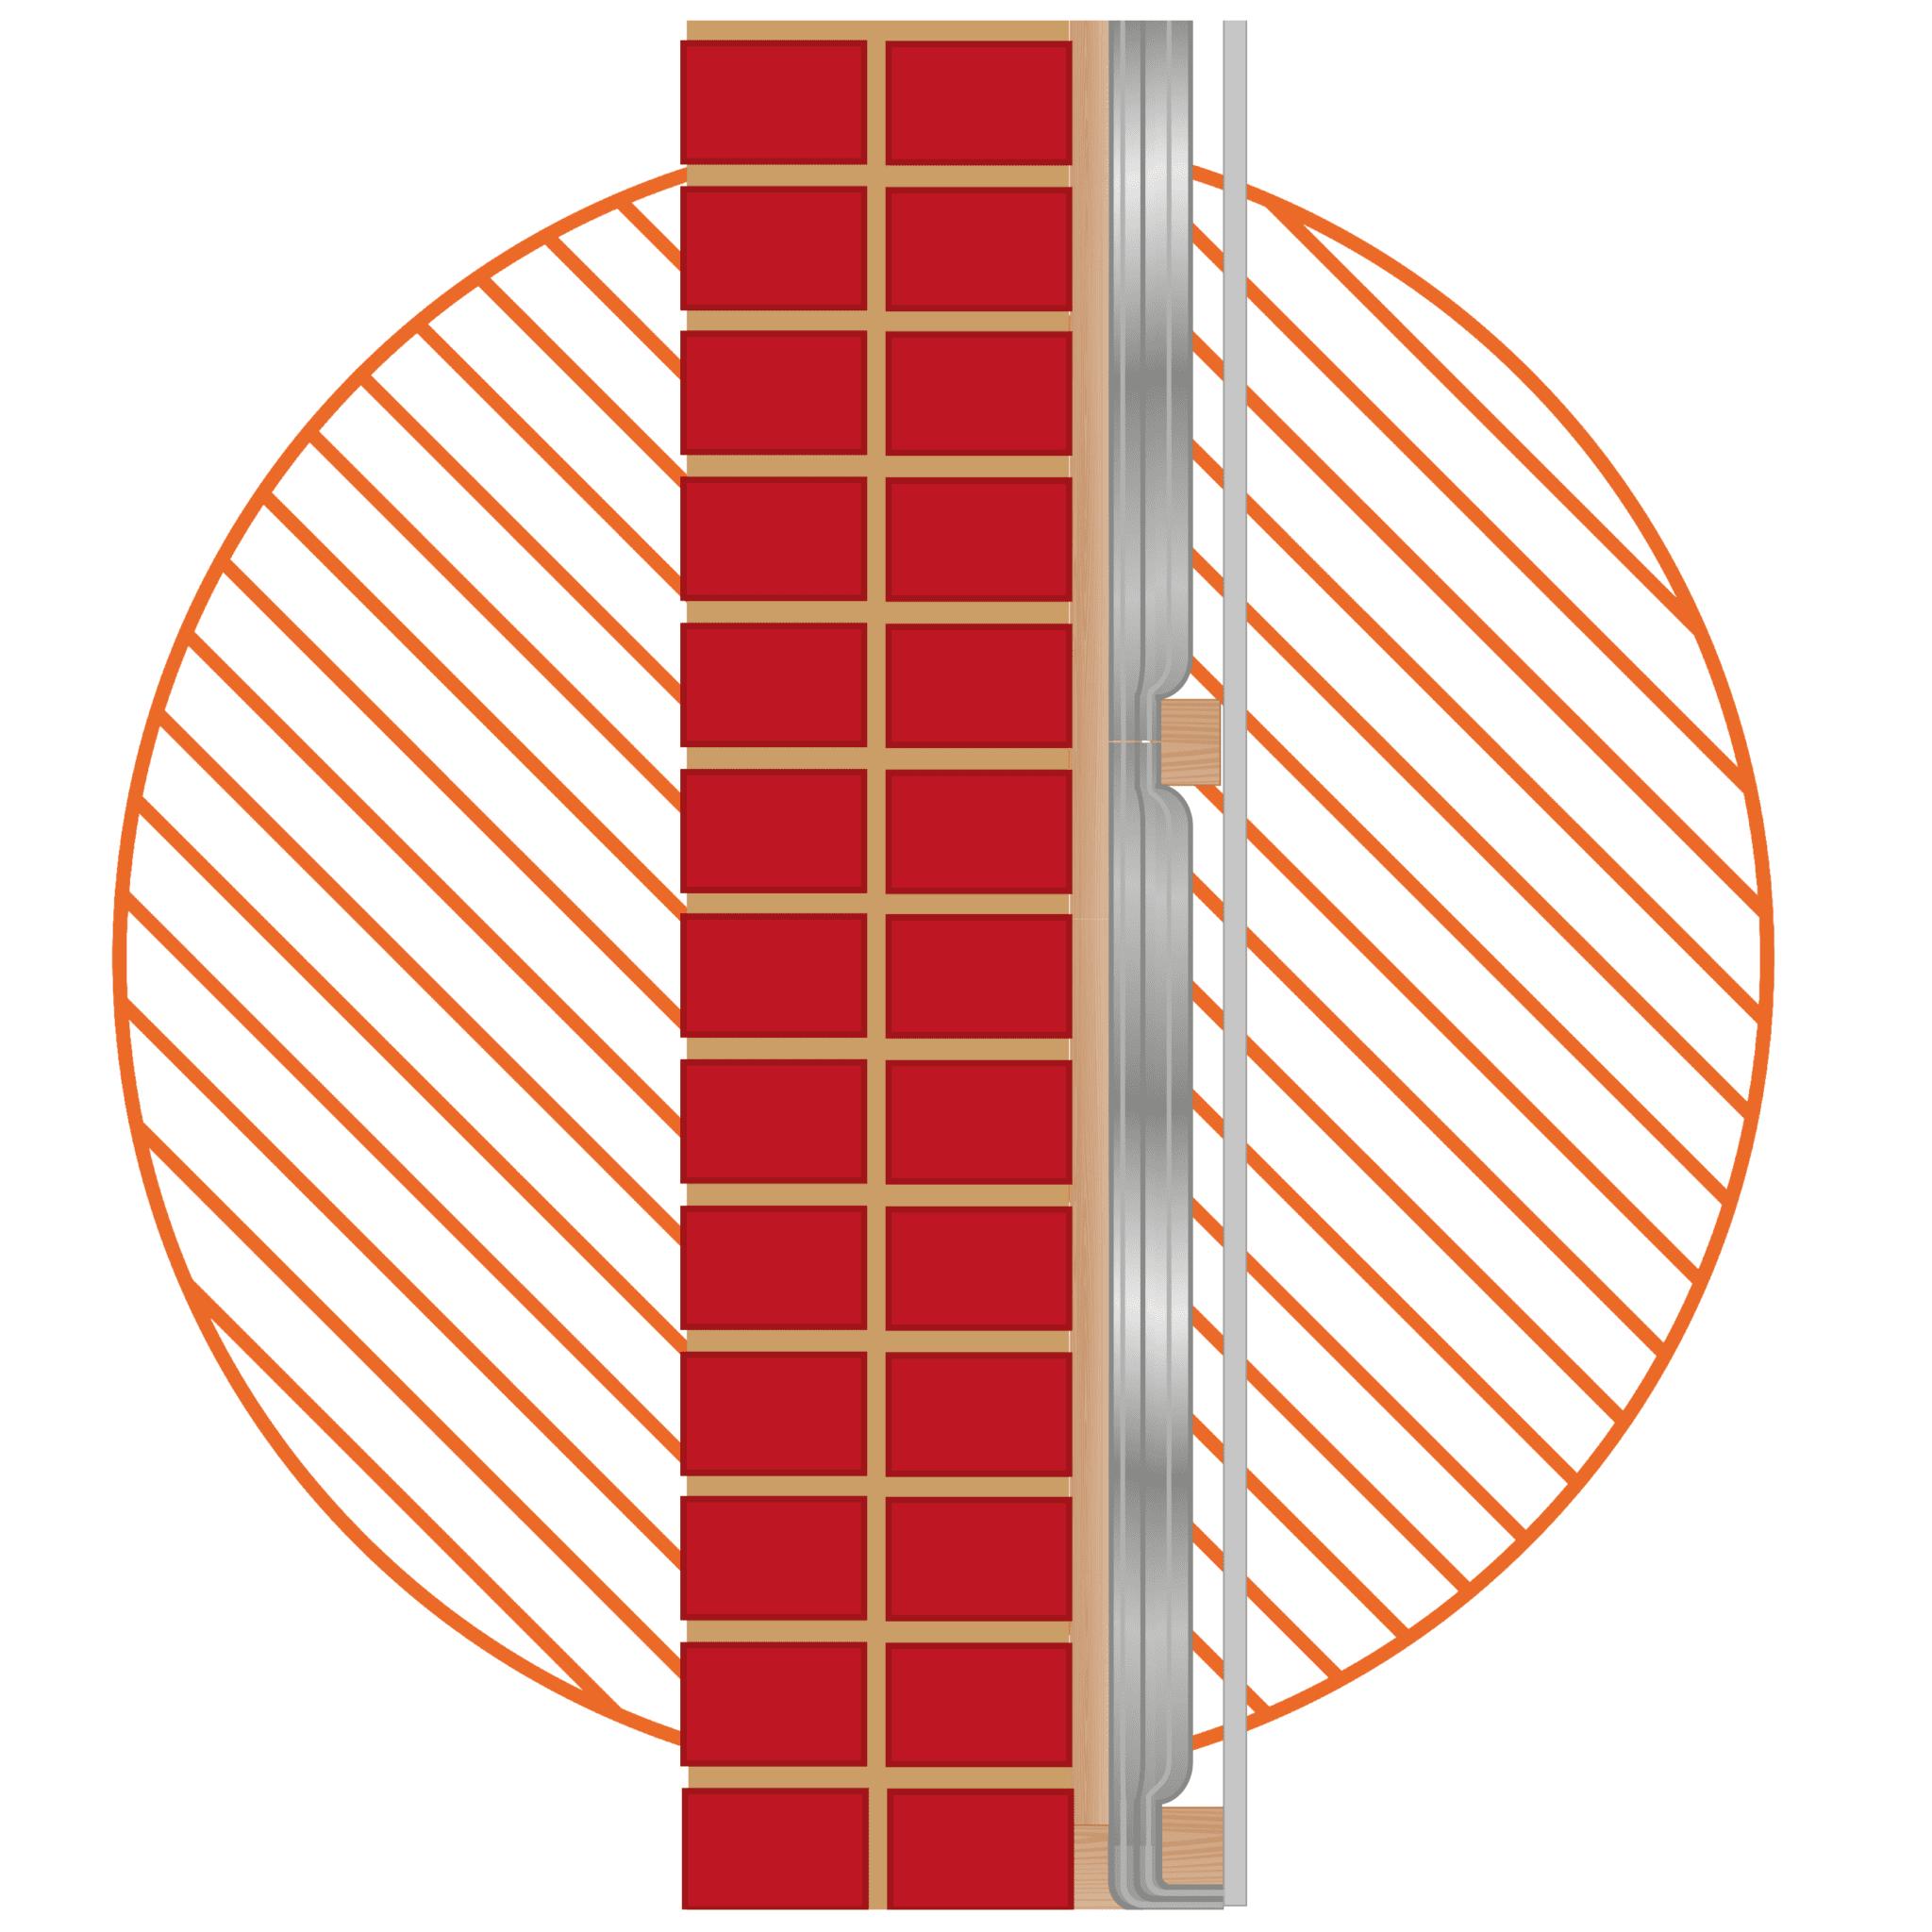 Solid Wall - Internal